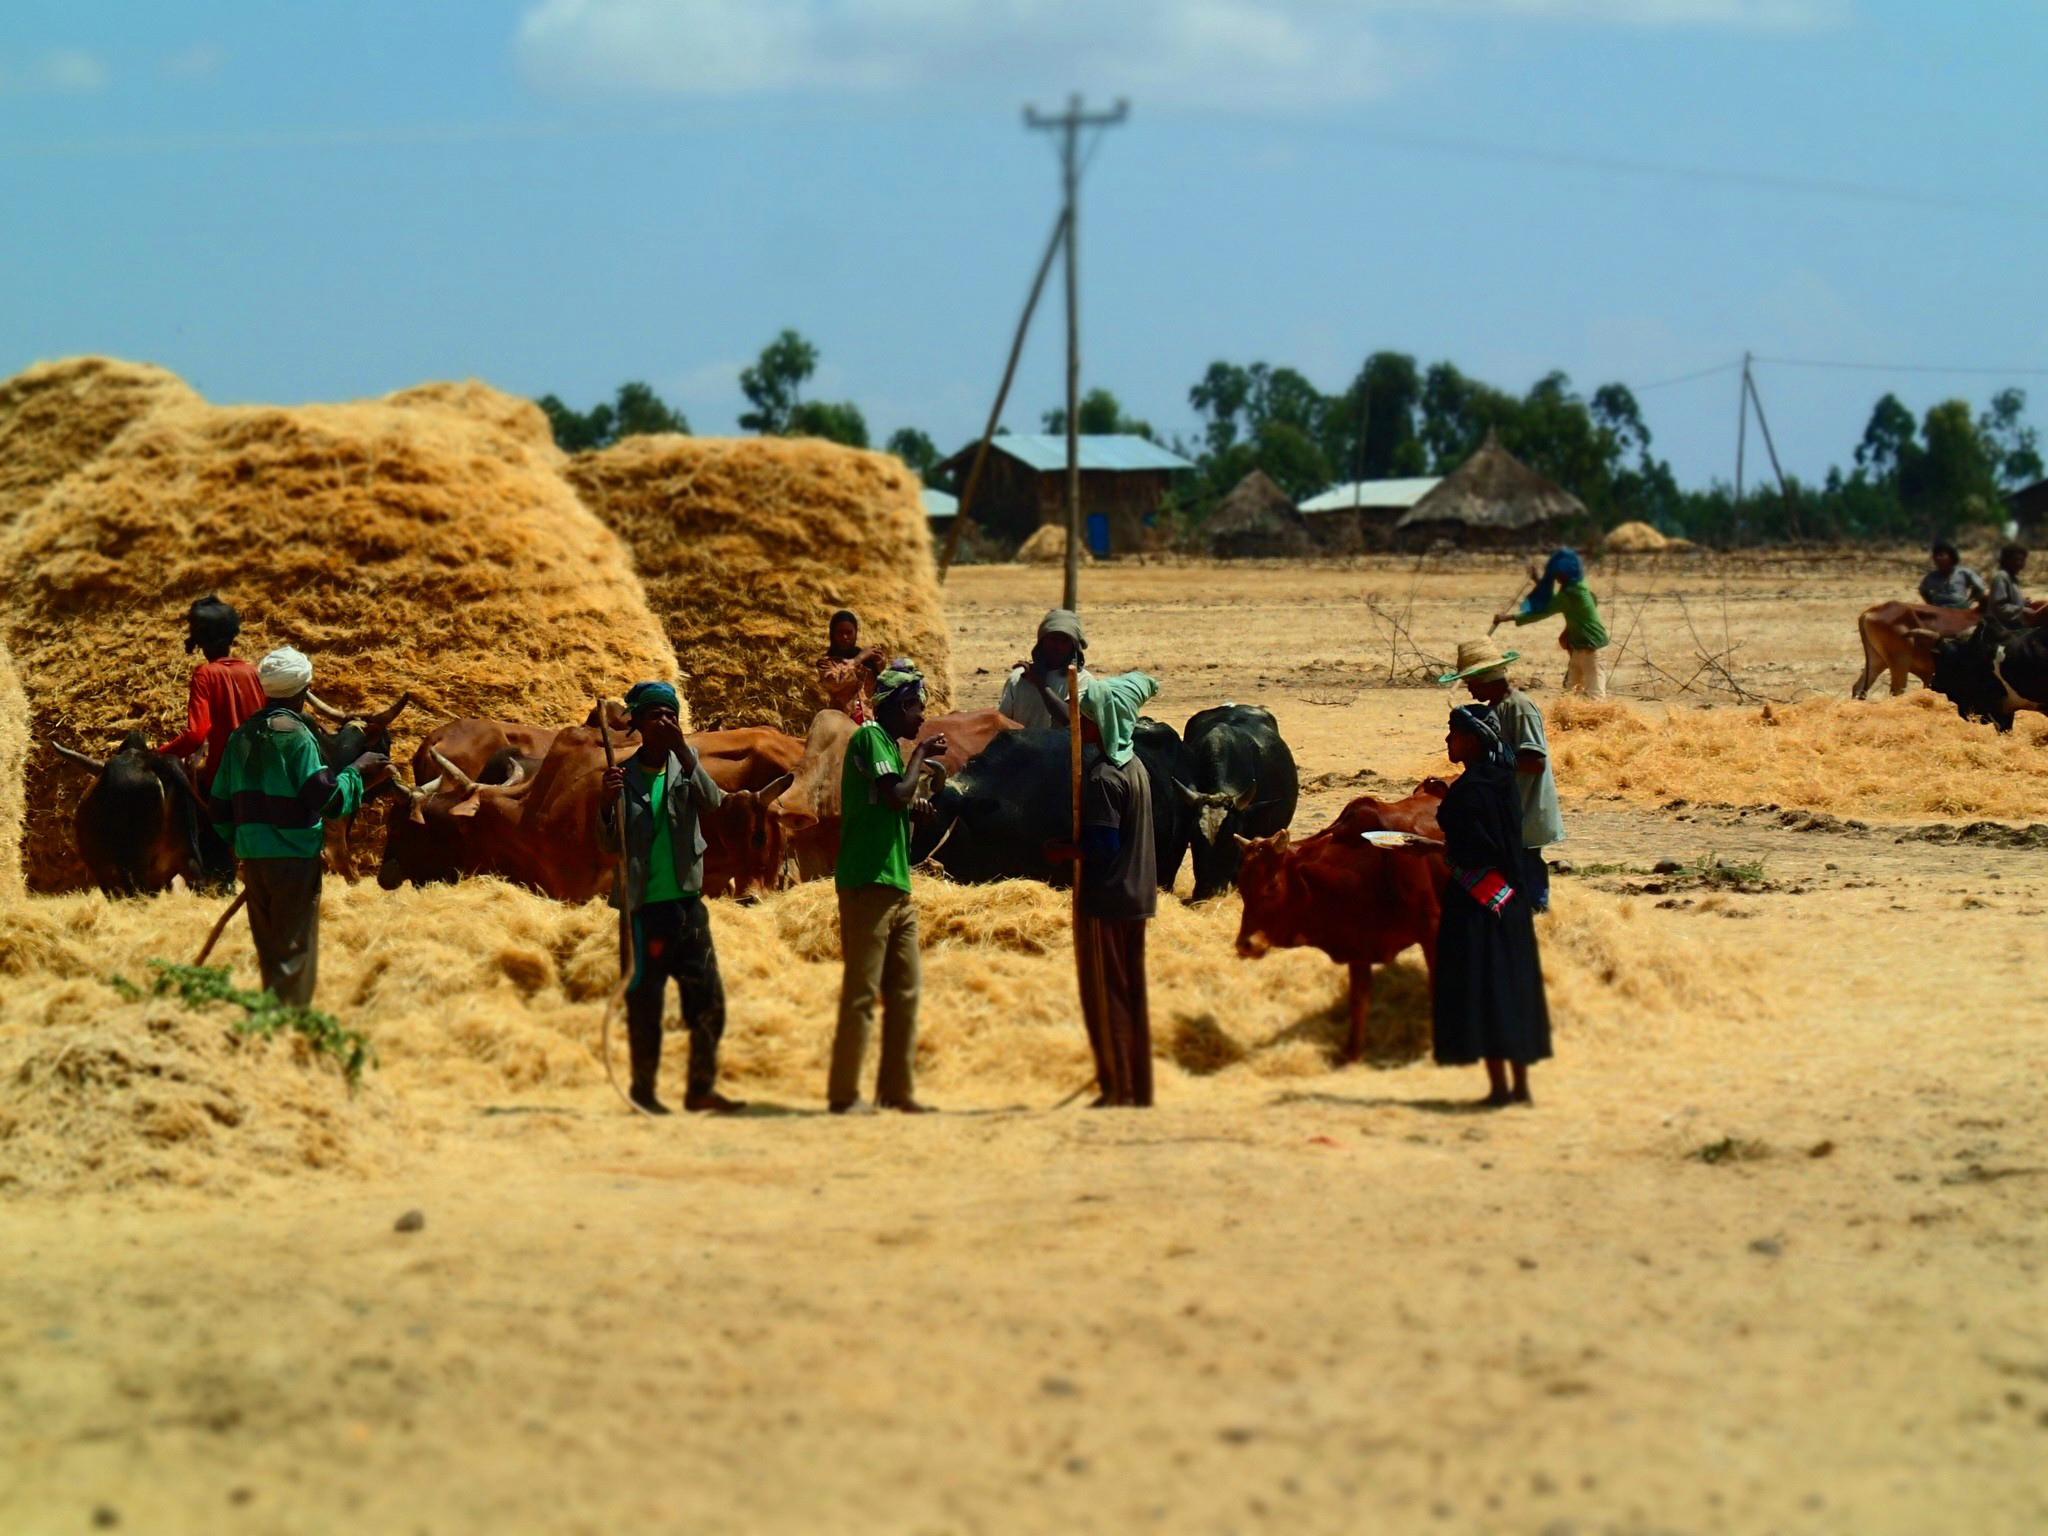 <p>Harvest in Ethiopia. Photo by SarahTz/Flickr</p>